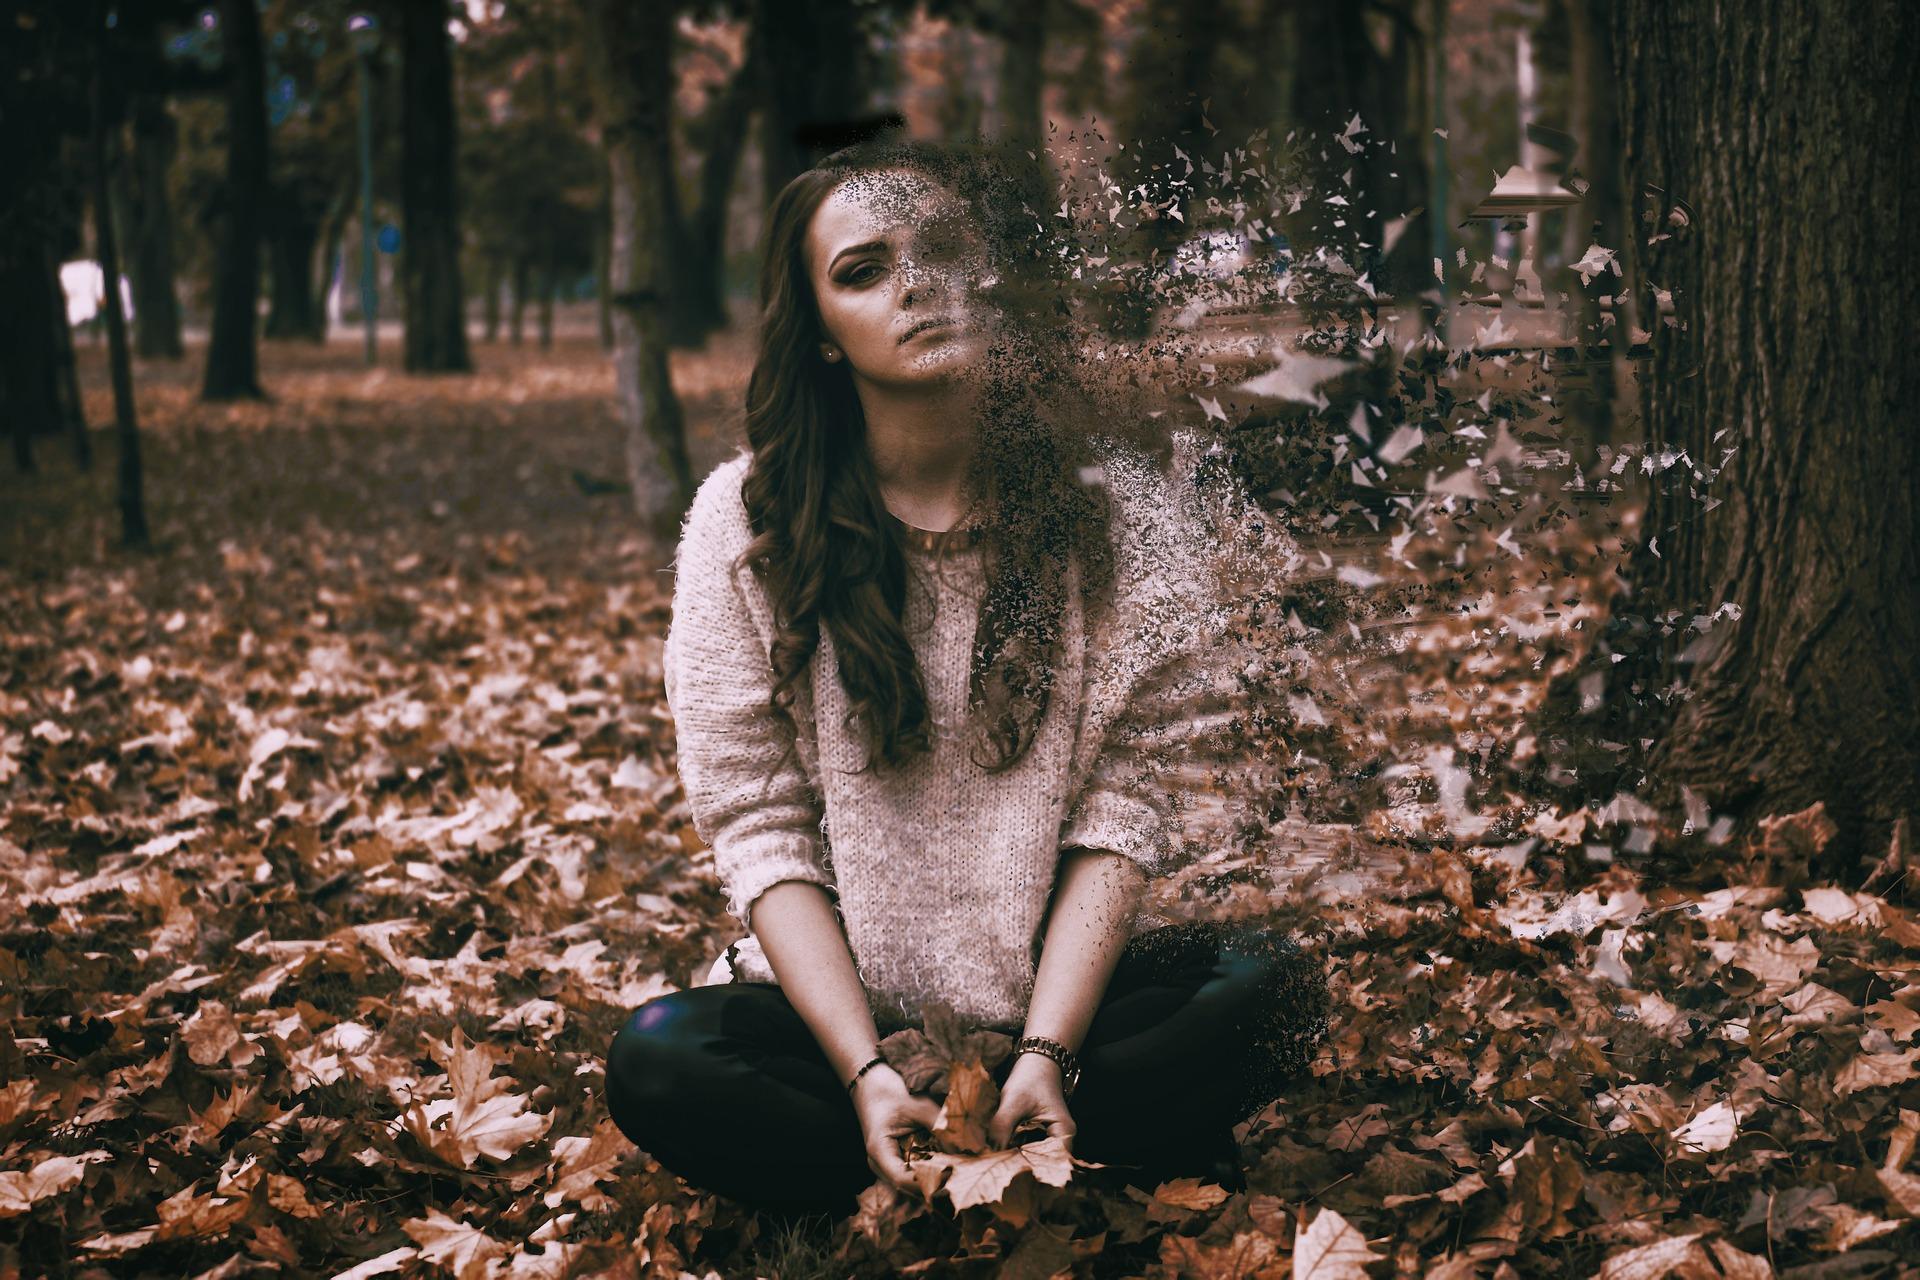 sadness-3434515_1920.jpg